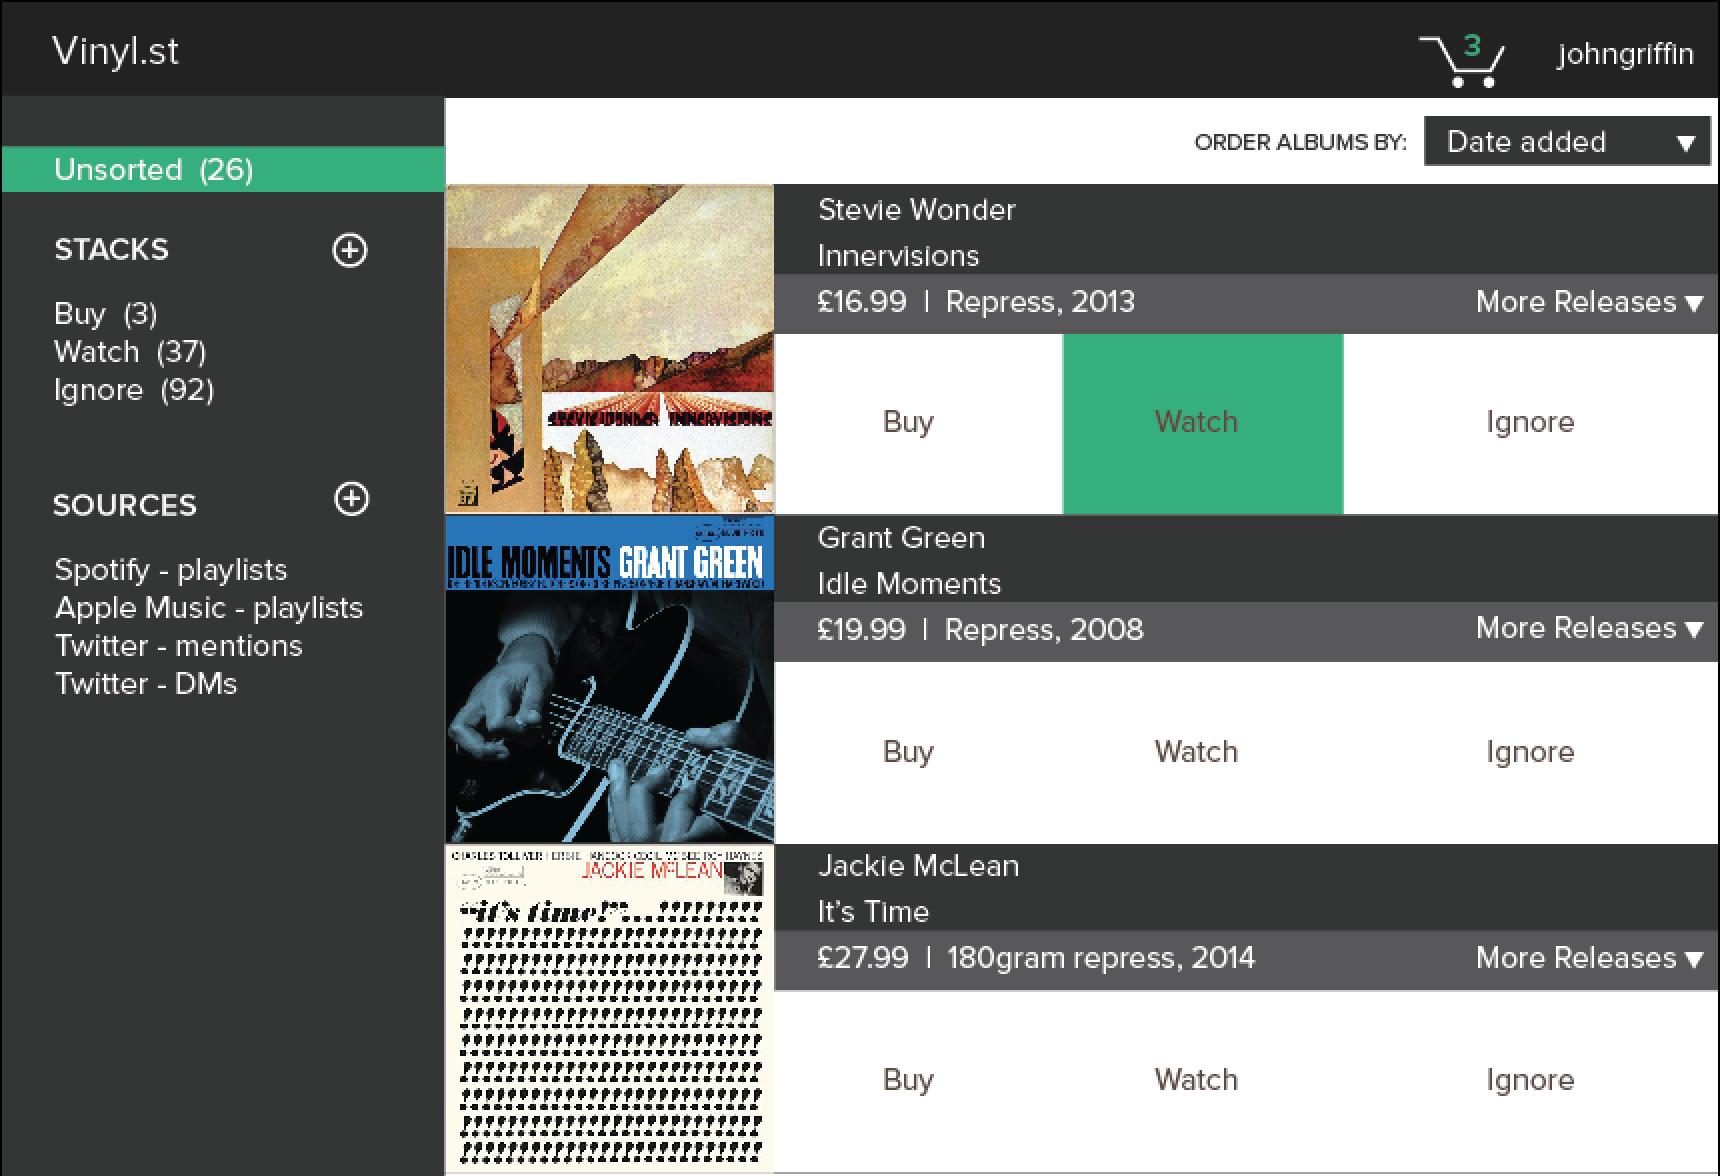 Mock up of Vinyl.st app